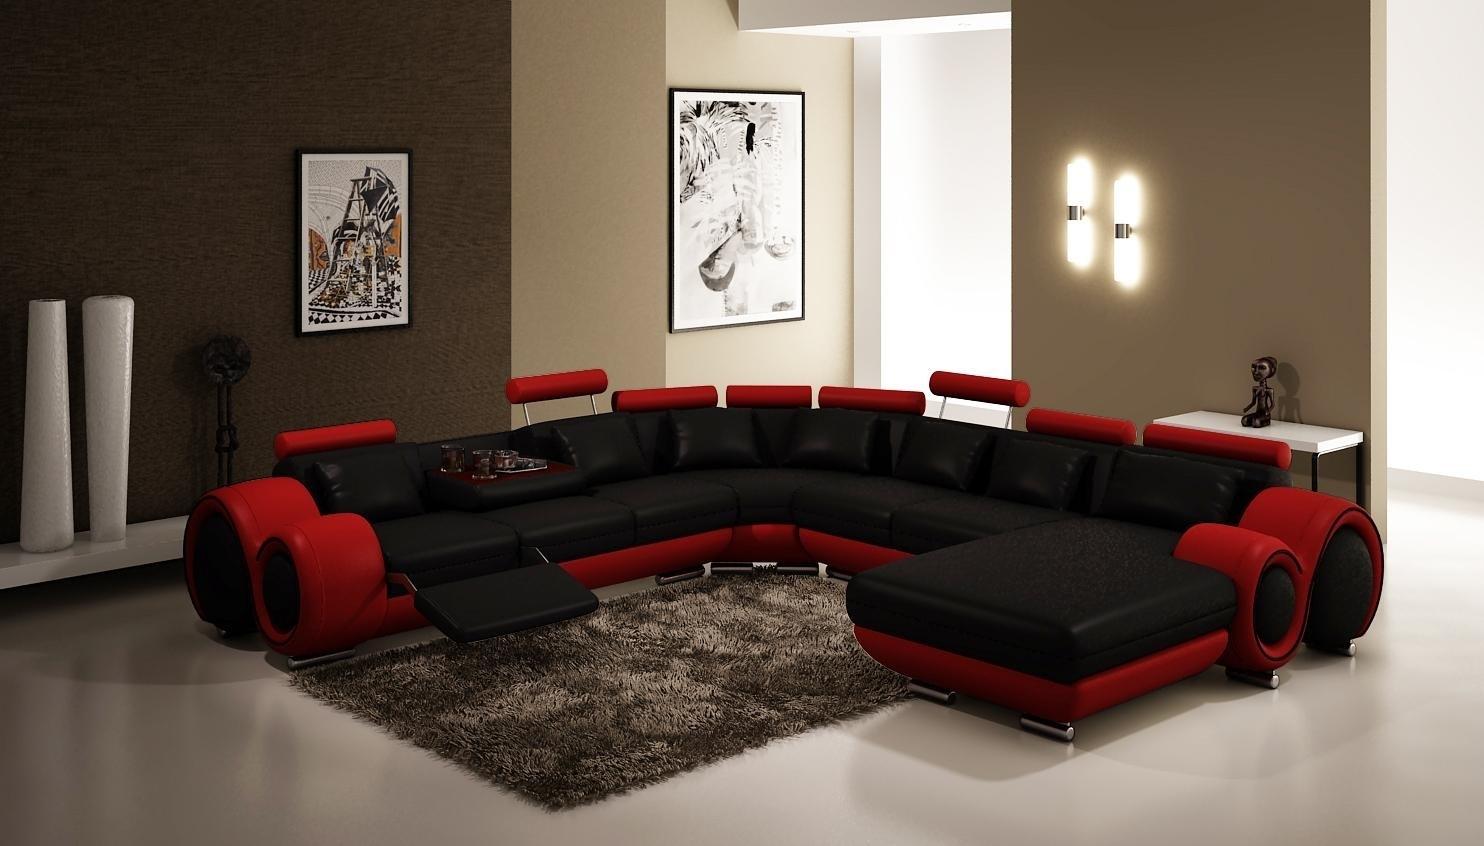 Sectional Couch Kijiji Edmonton Recliner Reviews Large Ottoman Sofa Pertaining To Kijiji Edmonton Sectional Sofas (View 8 of 10)